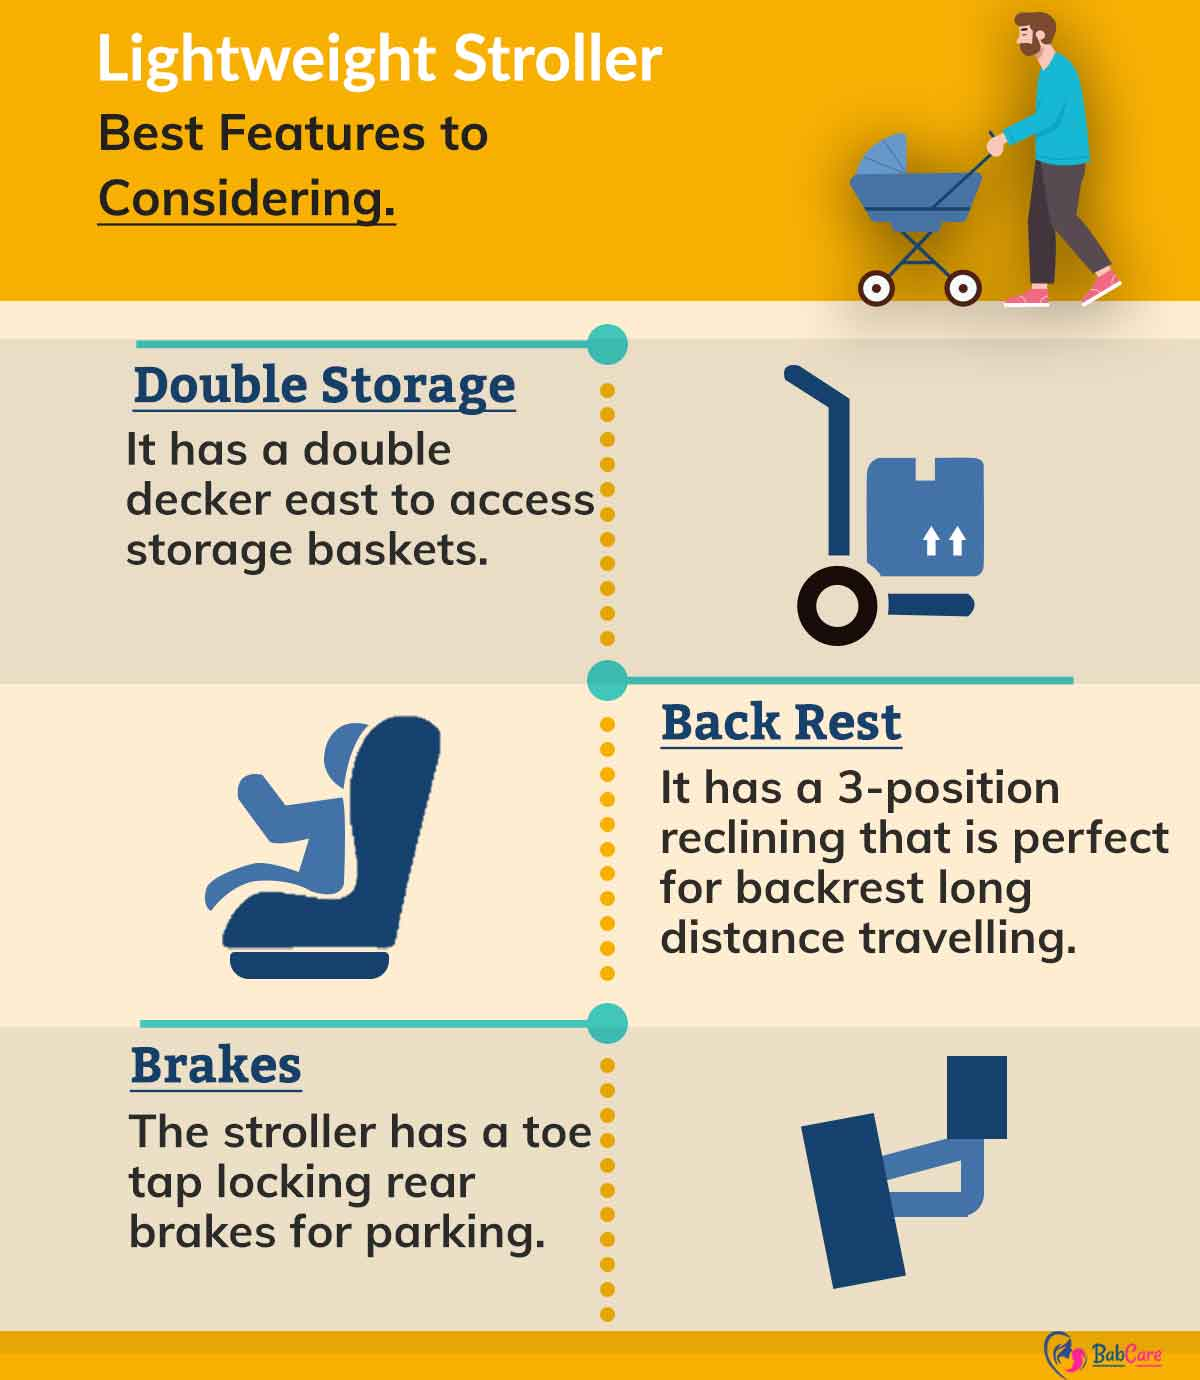 Maxi Cosi double decker storage, backrest, brakes